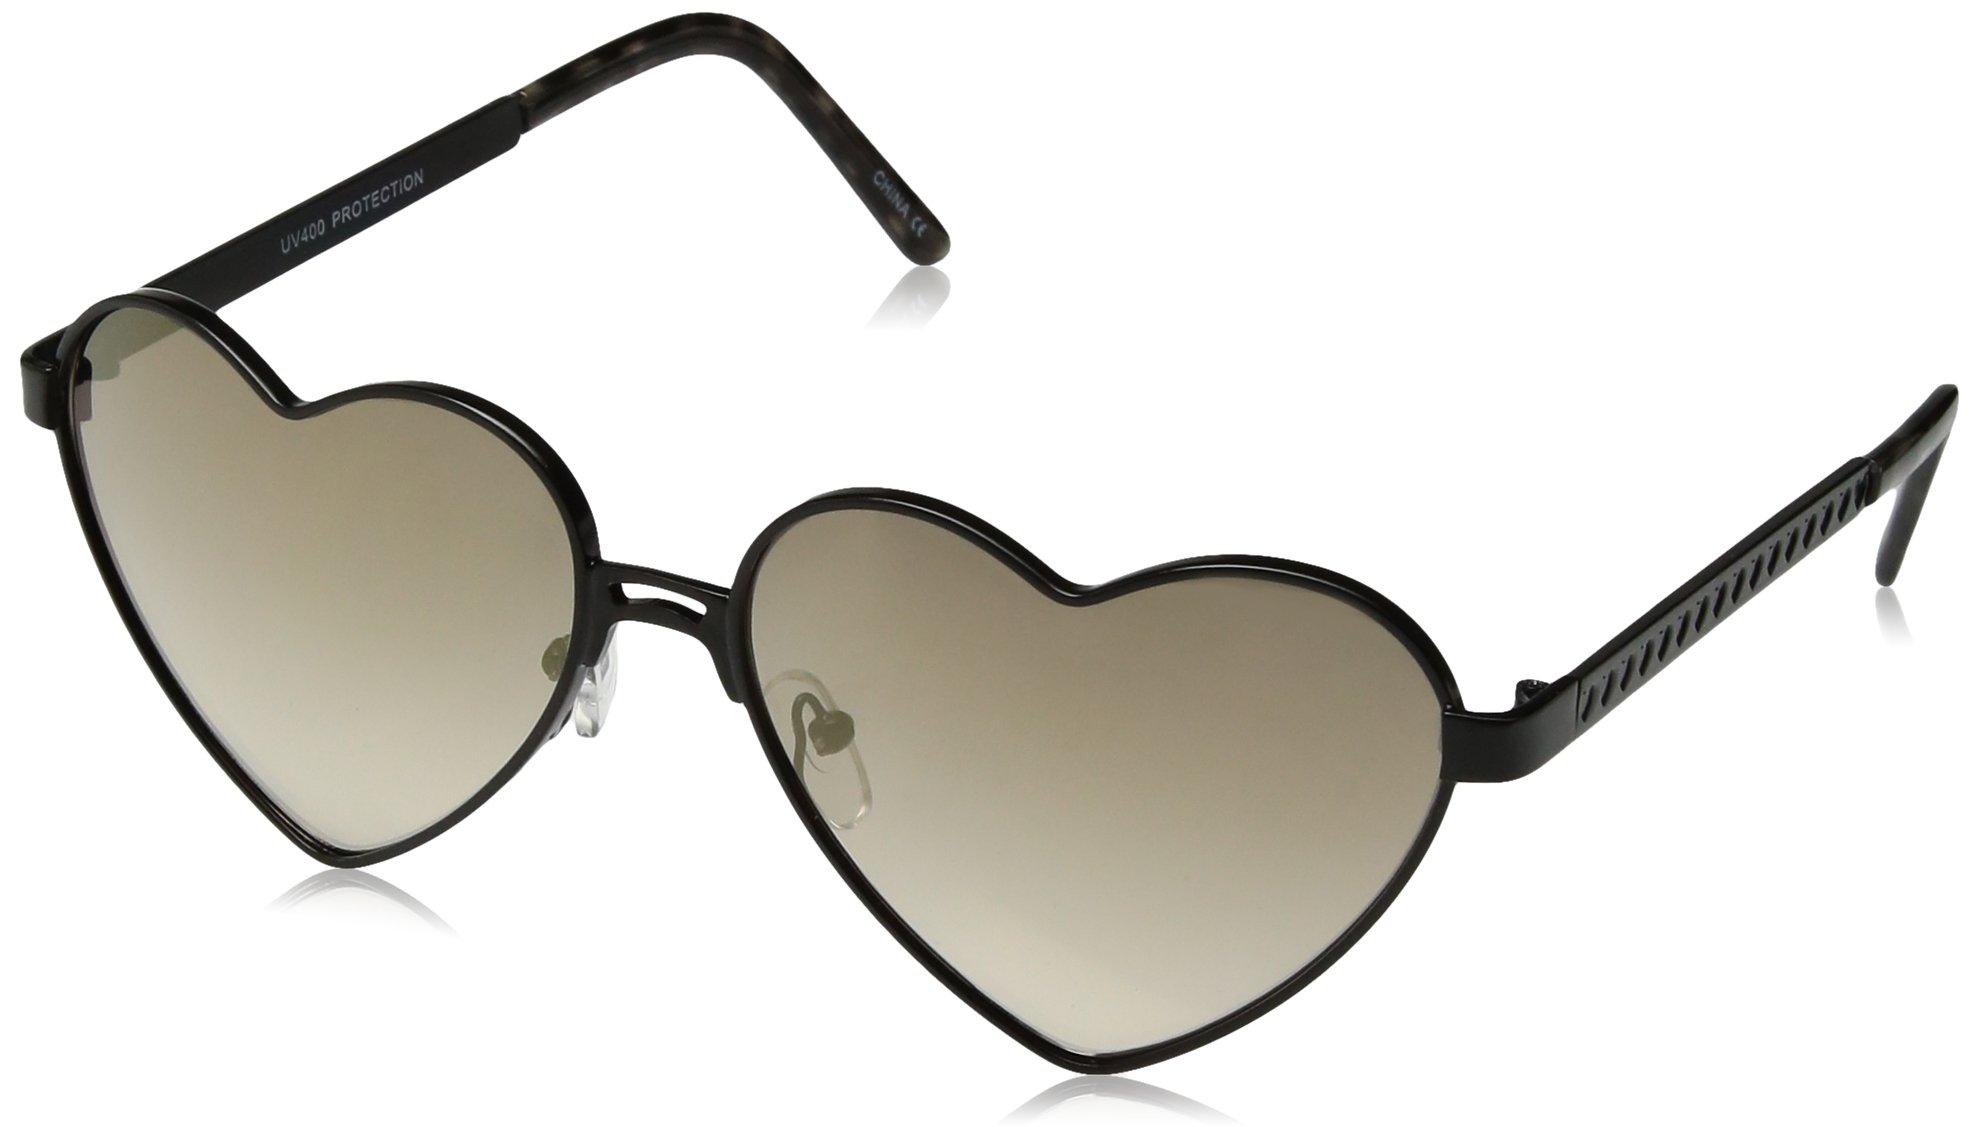 zeroUV Women's Cute Fashion Wire Metal Inset Lens Love Lolita Heart Shaped Aviator Sunglasses, Black/Gold Mirror, 55 mm